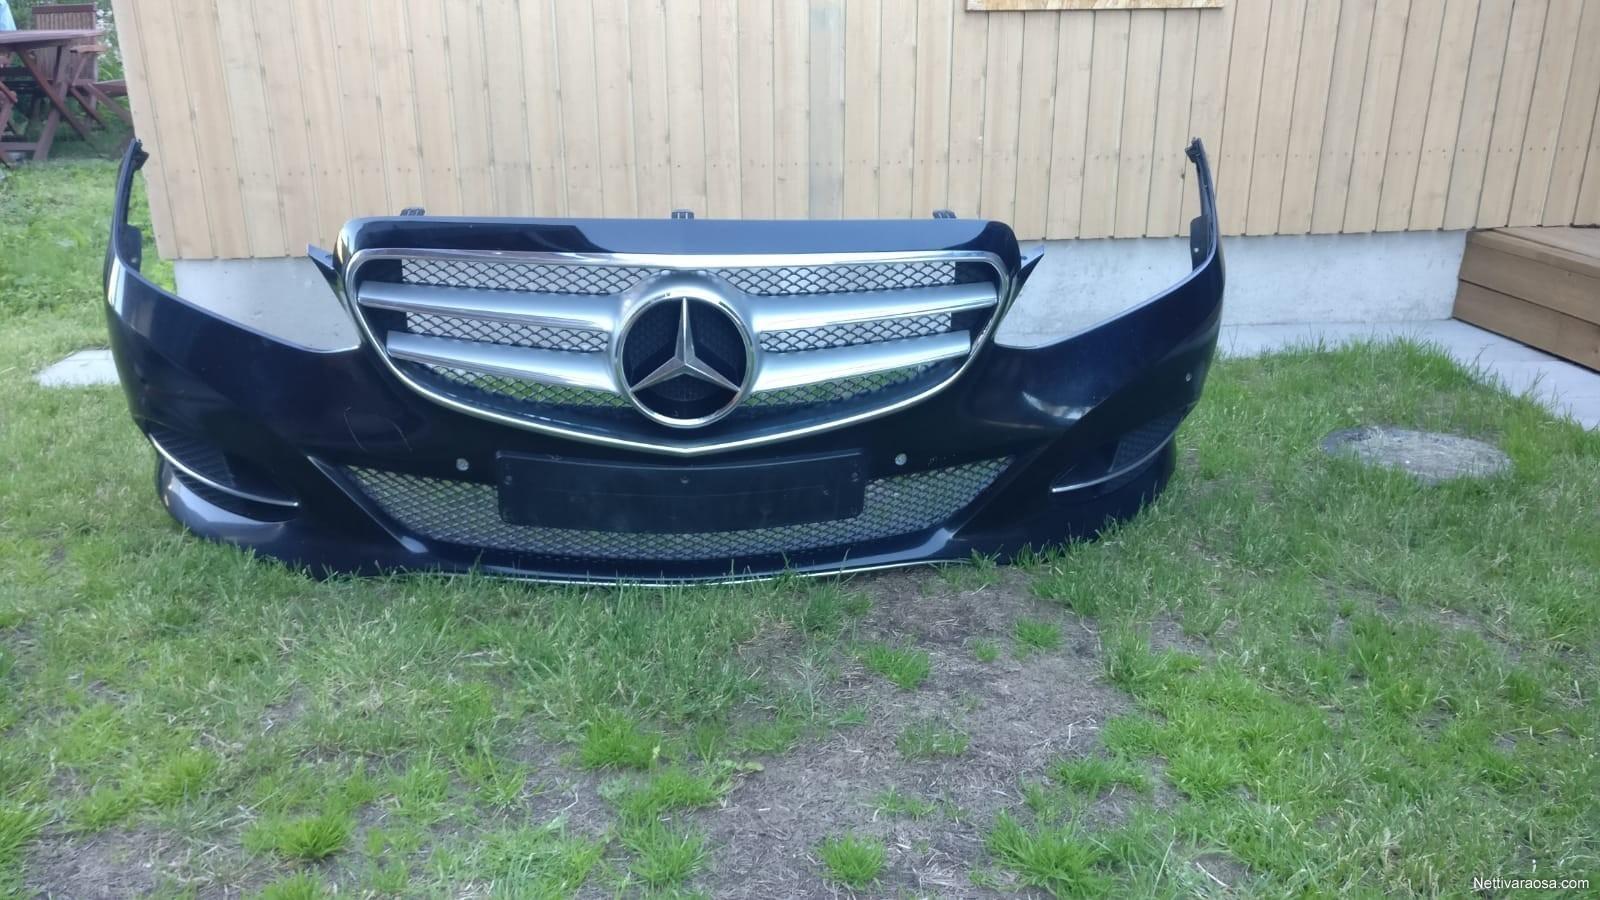 Nettivaraosa mercedes benz w212 2014 alkuper inen for Mercedes benz e 350 2014